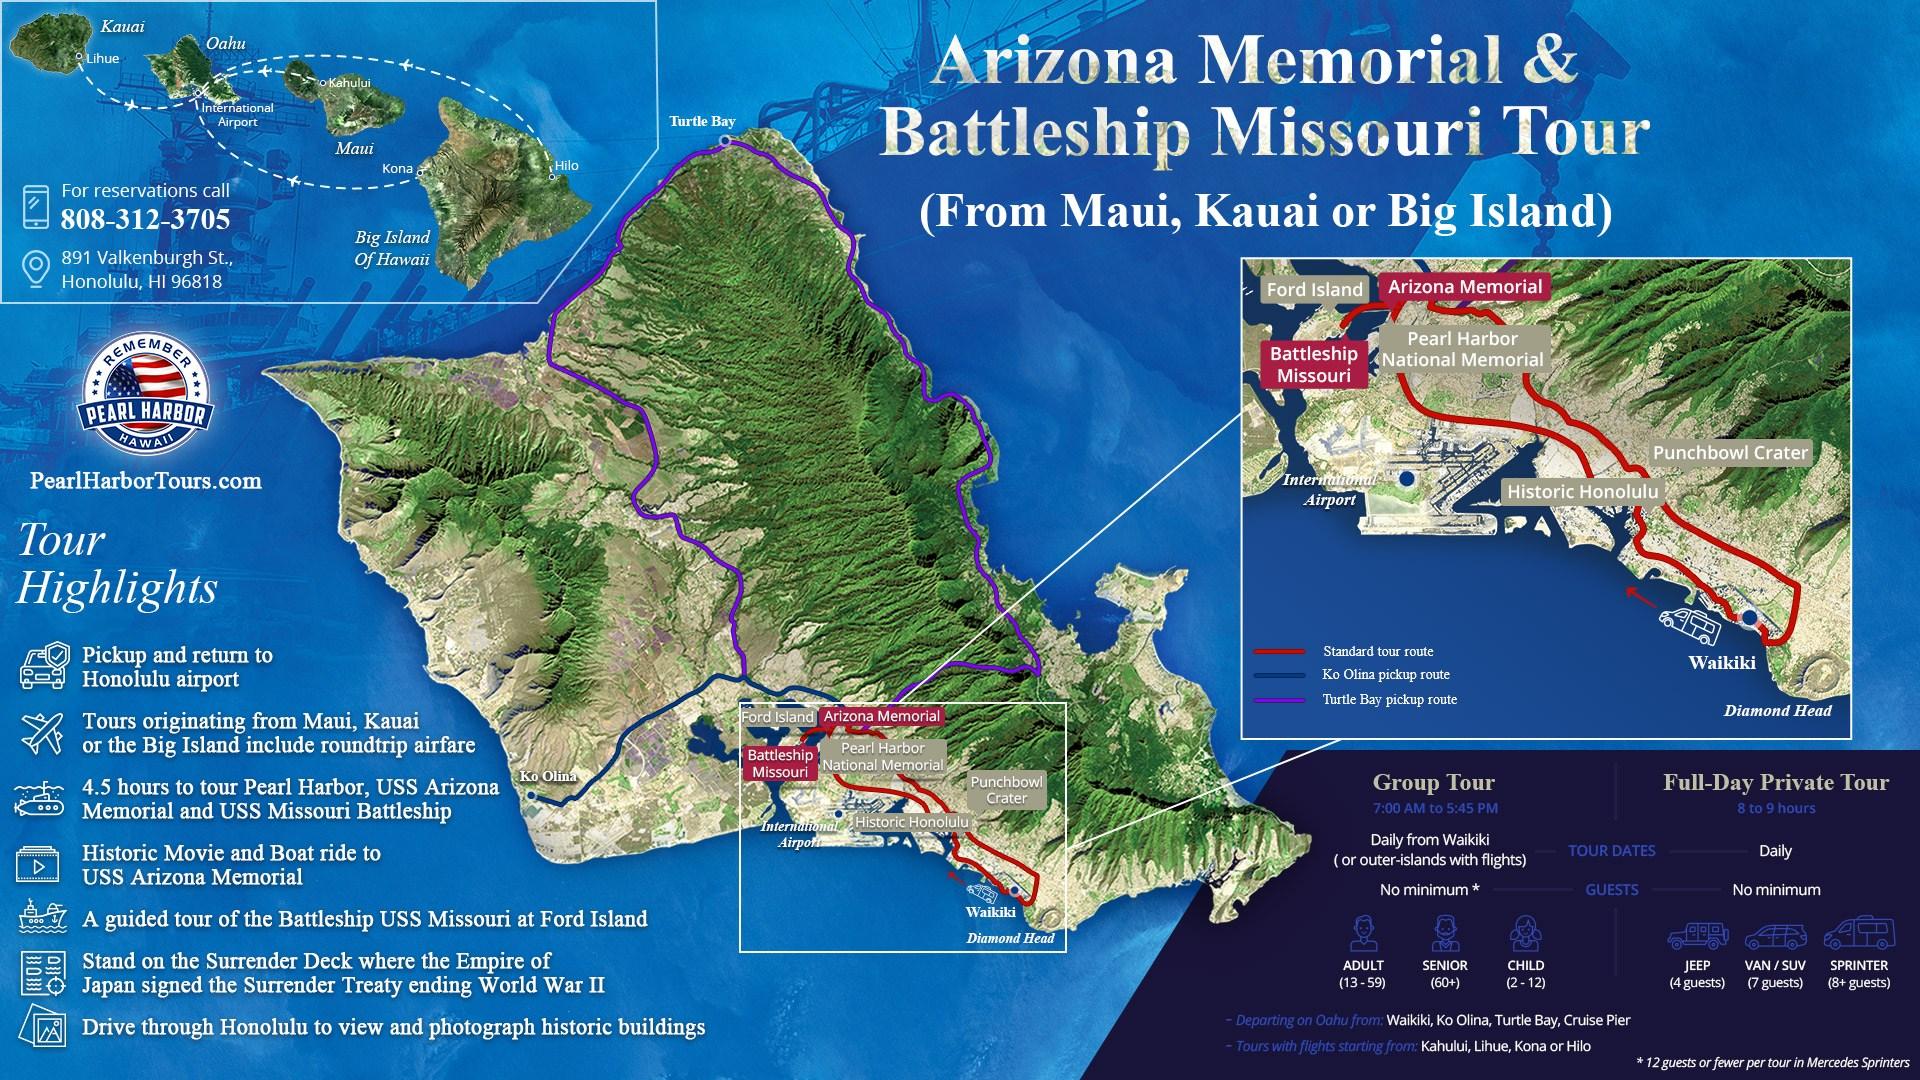 Arizona Memorial & Battleship Missouri Tour From Maui Kauai Or Big Island Map